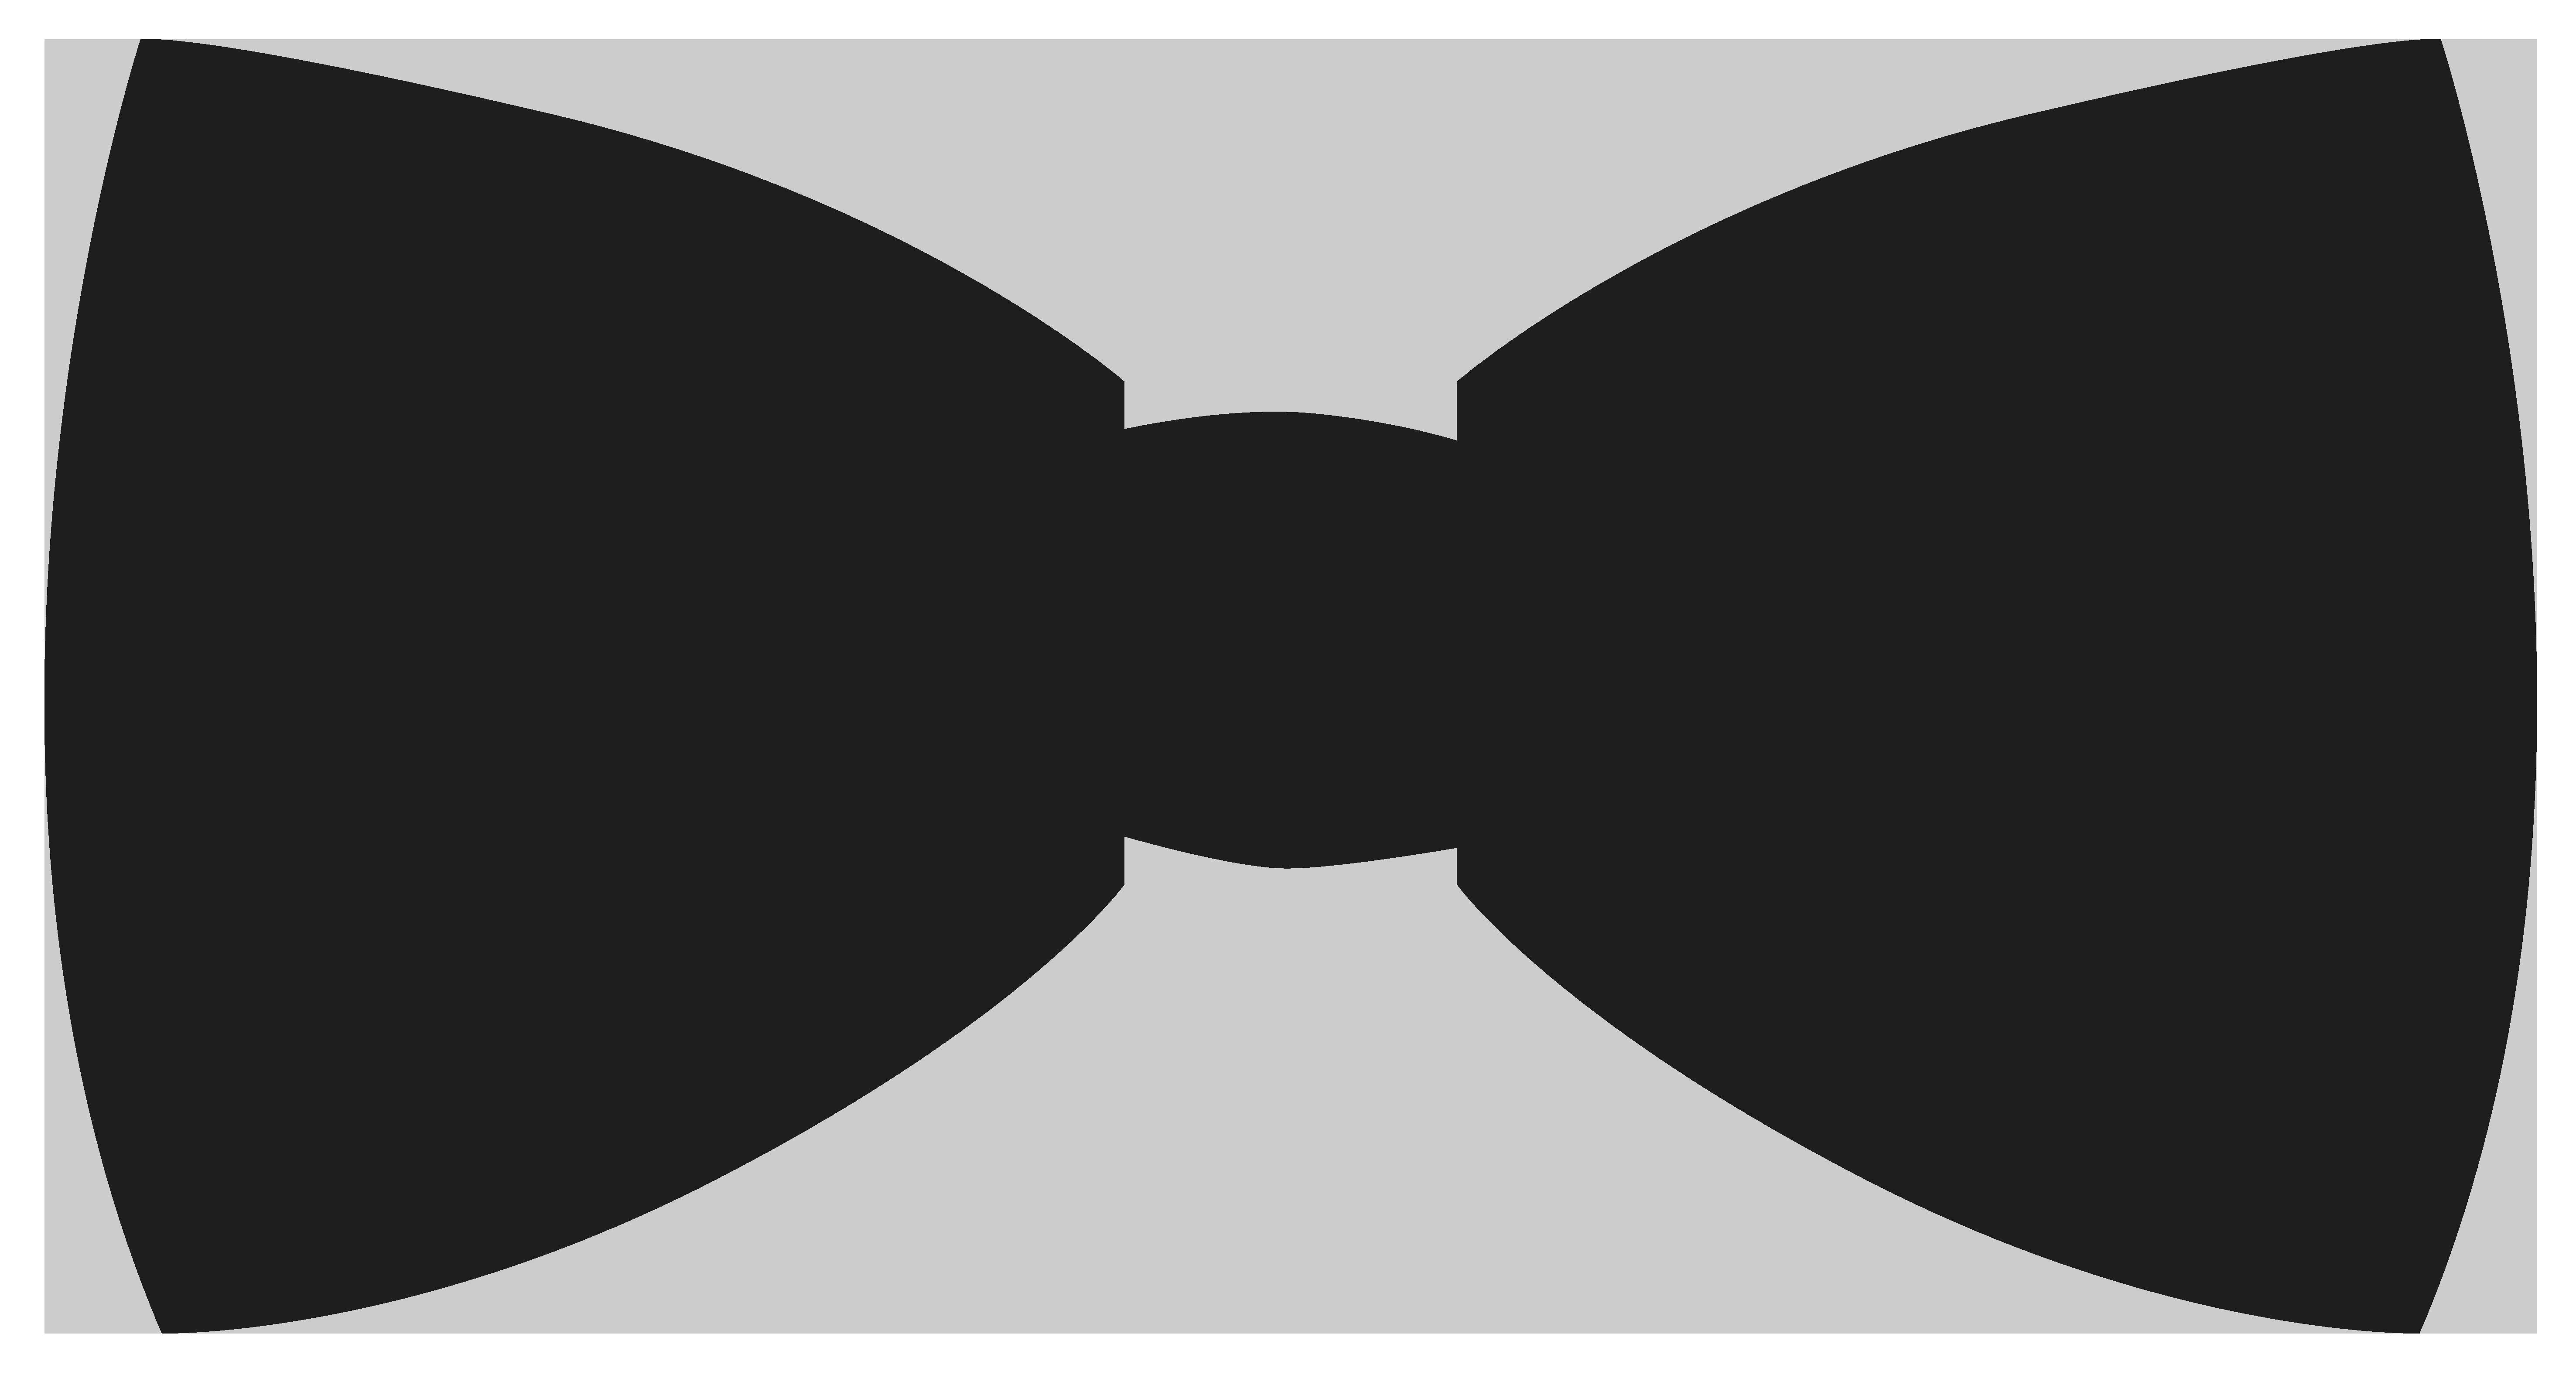 Clipart bow necktie. Tie clip art movember